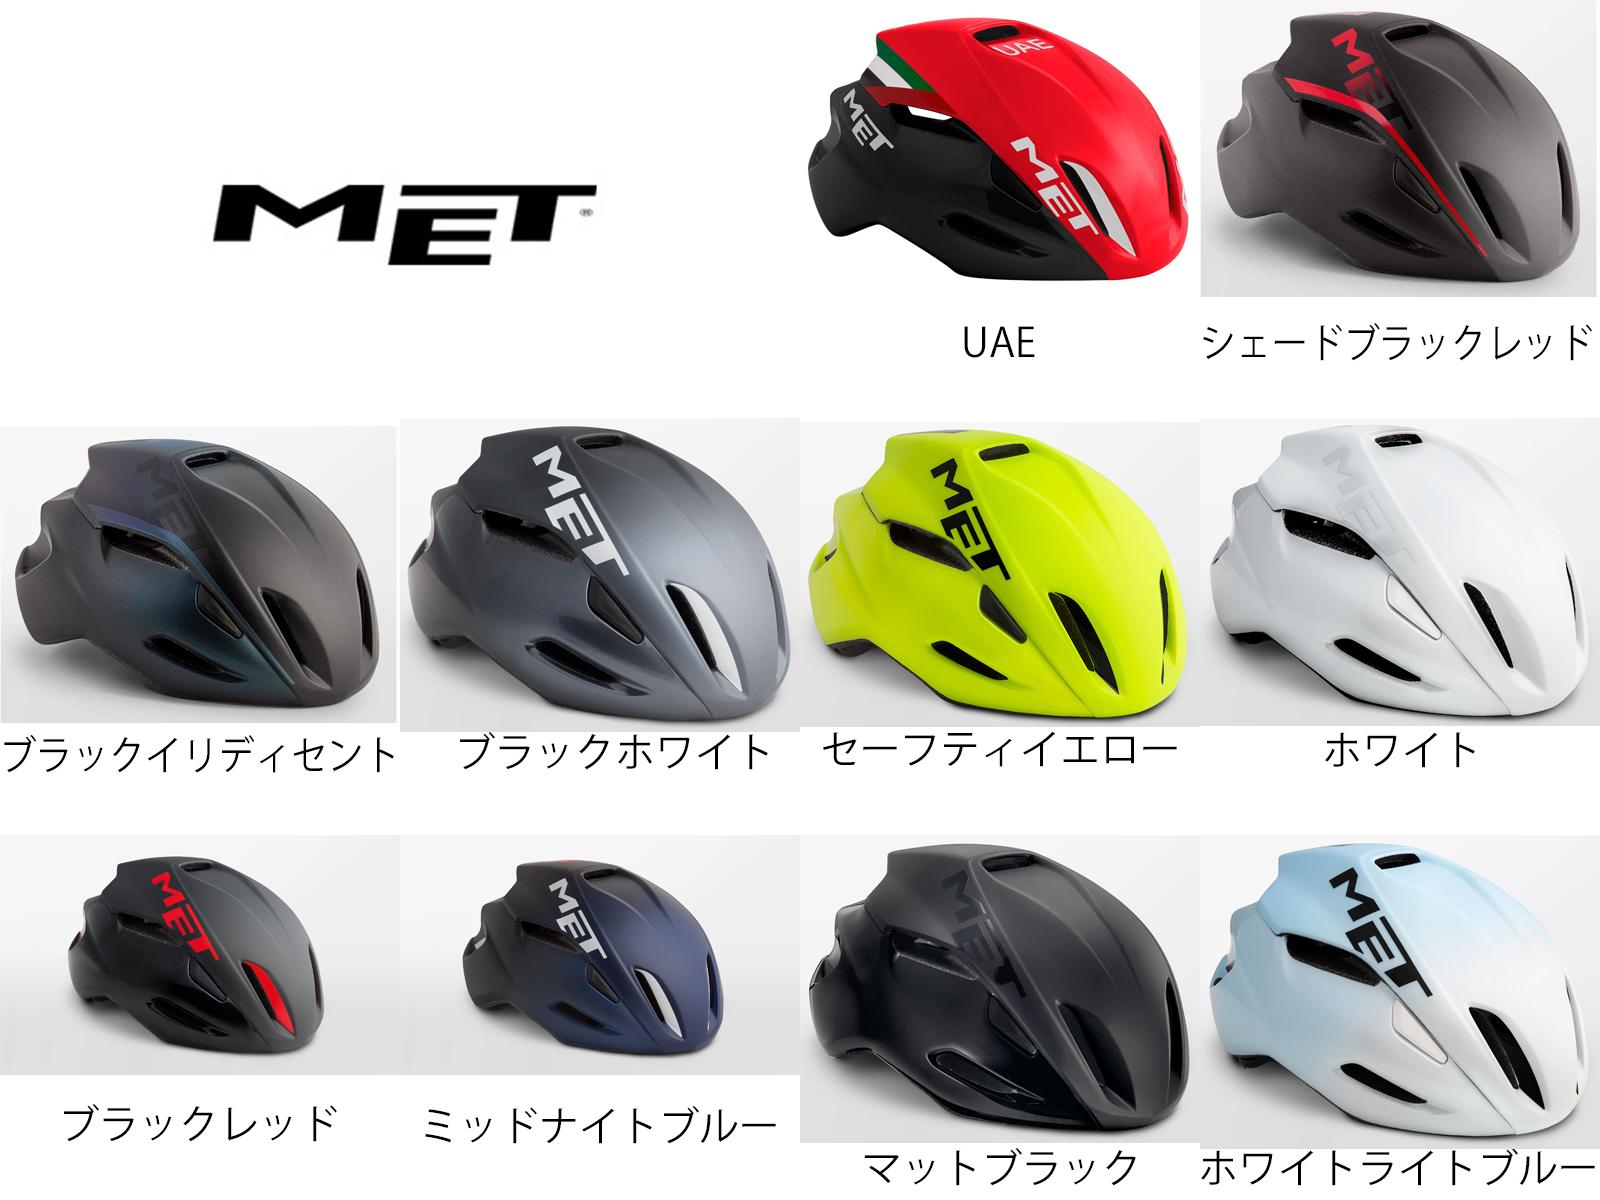 MET メット 大好評です MANTA HES JCF公認 マンタ HELMET オープニング 大放出セール ヘルメット